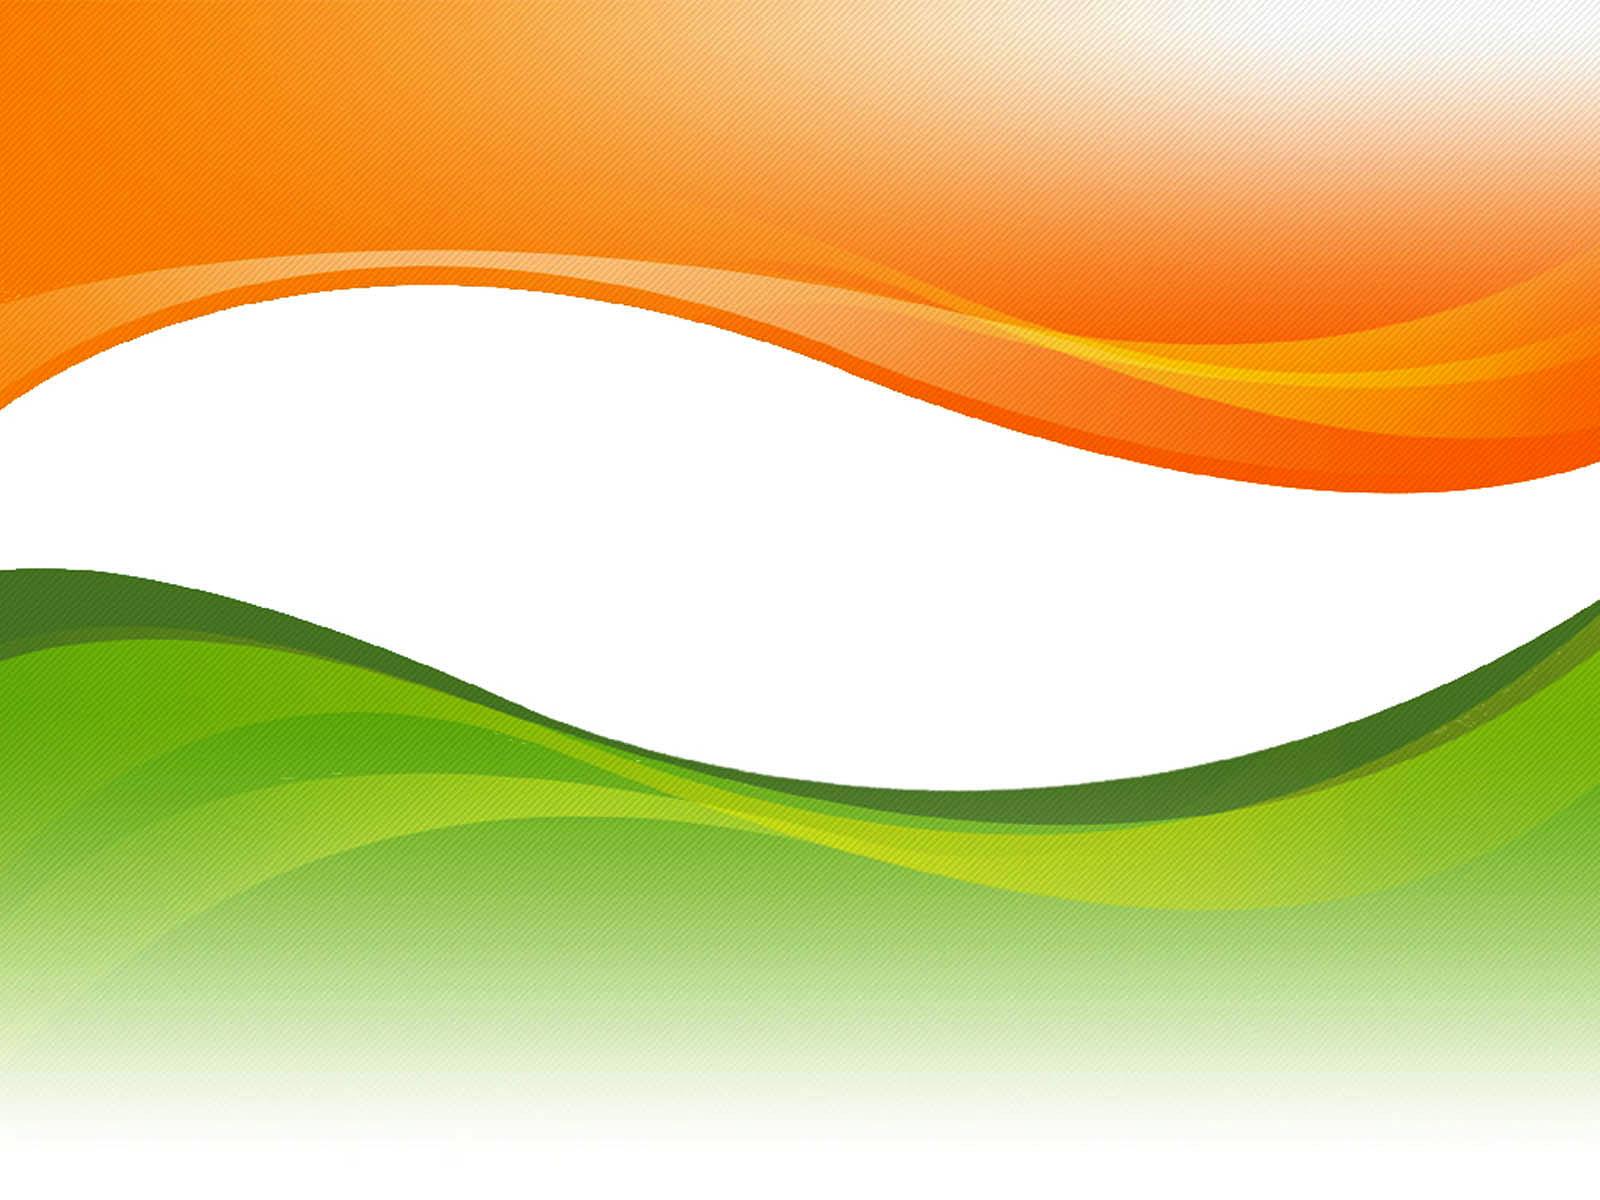 Indian Flag Wallpaper High Resolution Hd Download